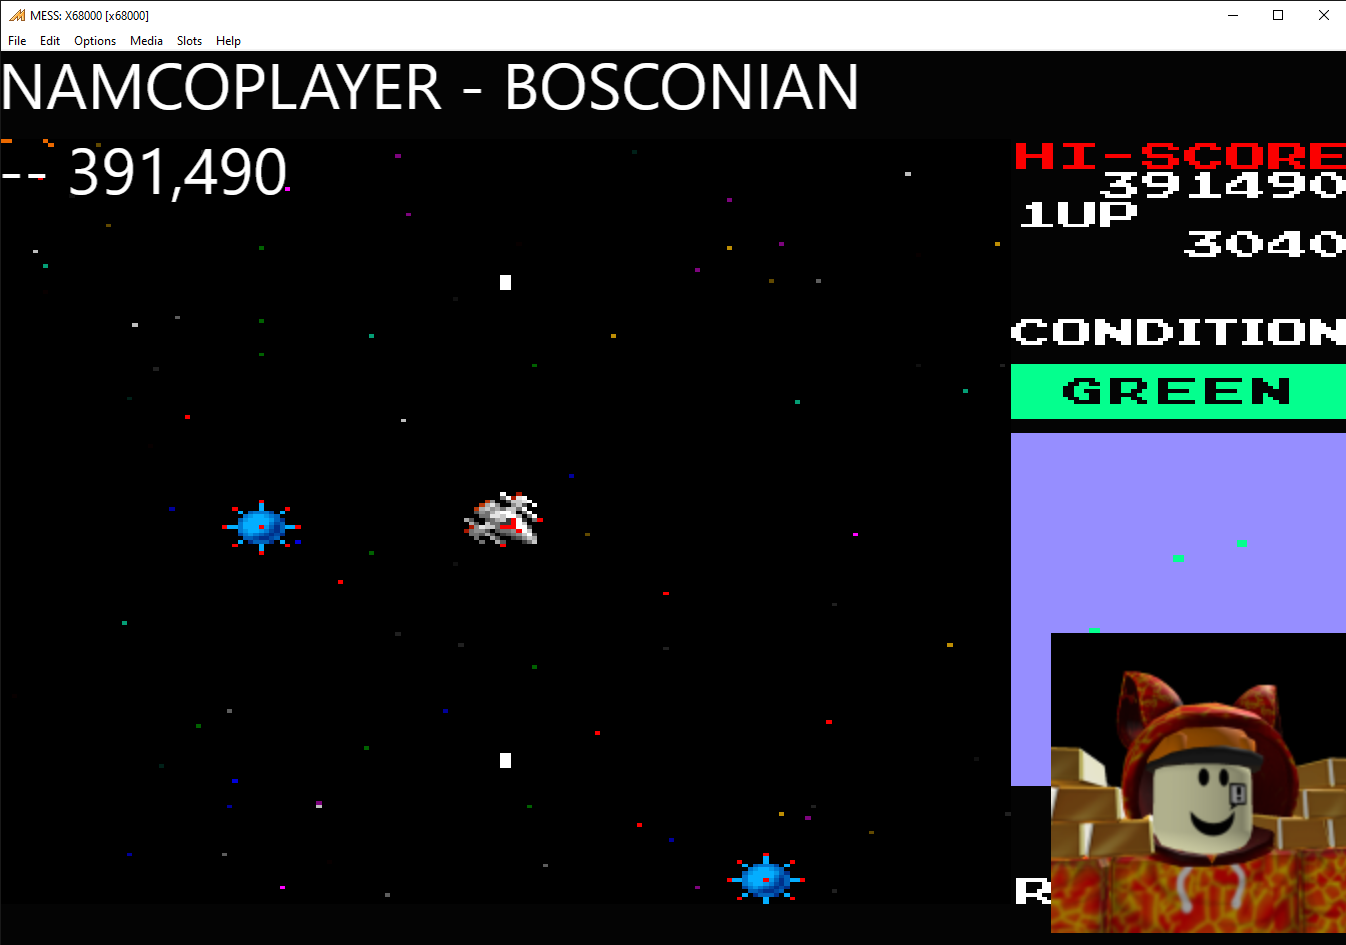 Bosconian 391,490 points